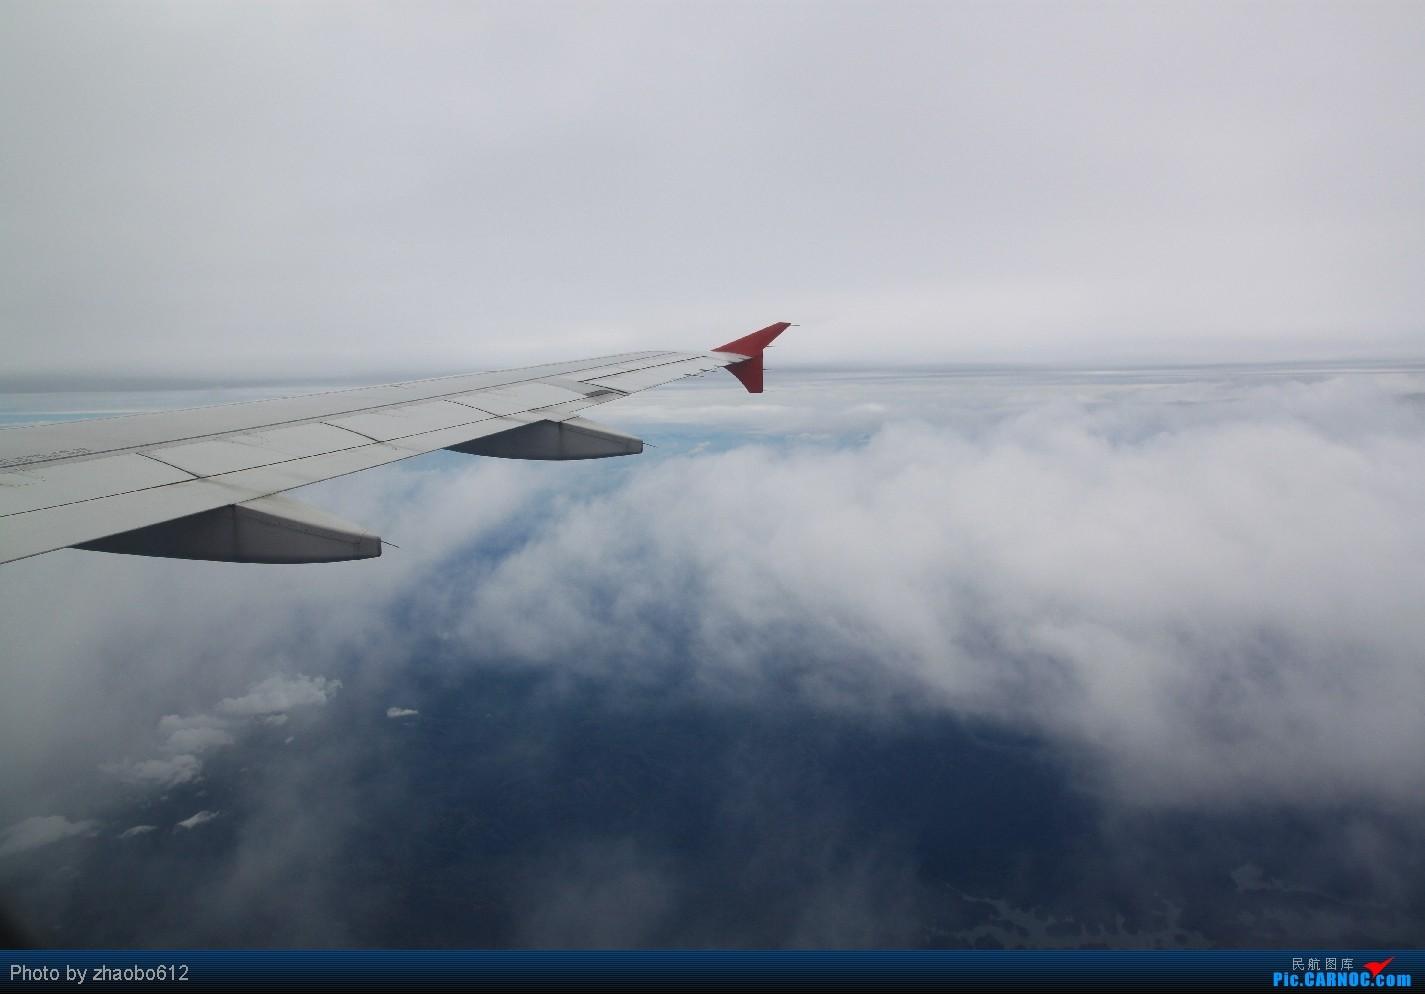 Re:[原创]亚航带我去旅行,再遇彩绘机(中集)    马来西亚瓜拉丁加奴机场